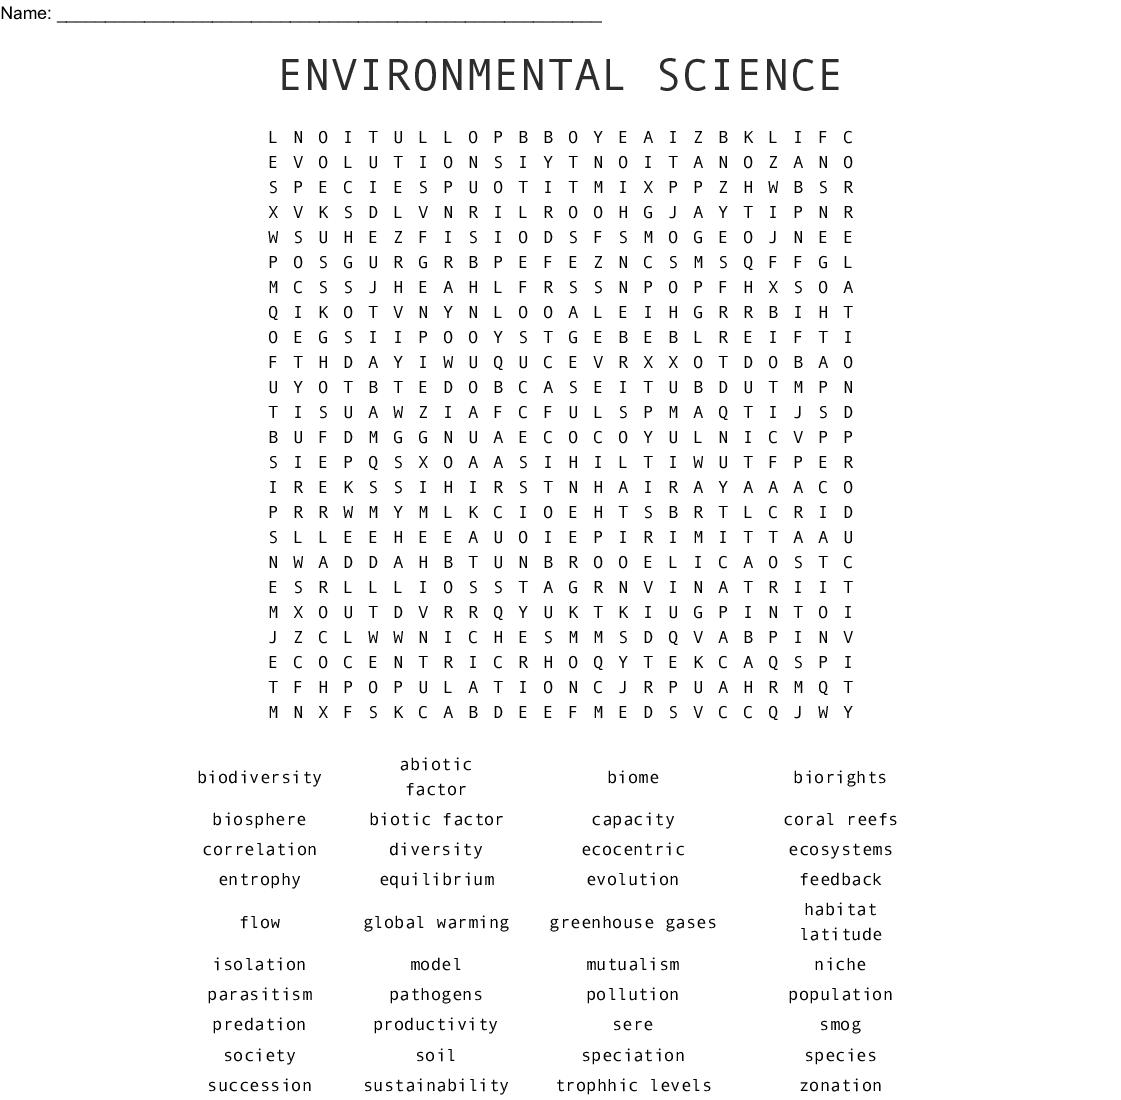 Environmental Science Word Search - Wordmint